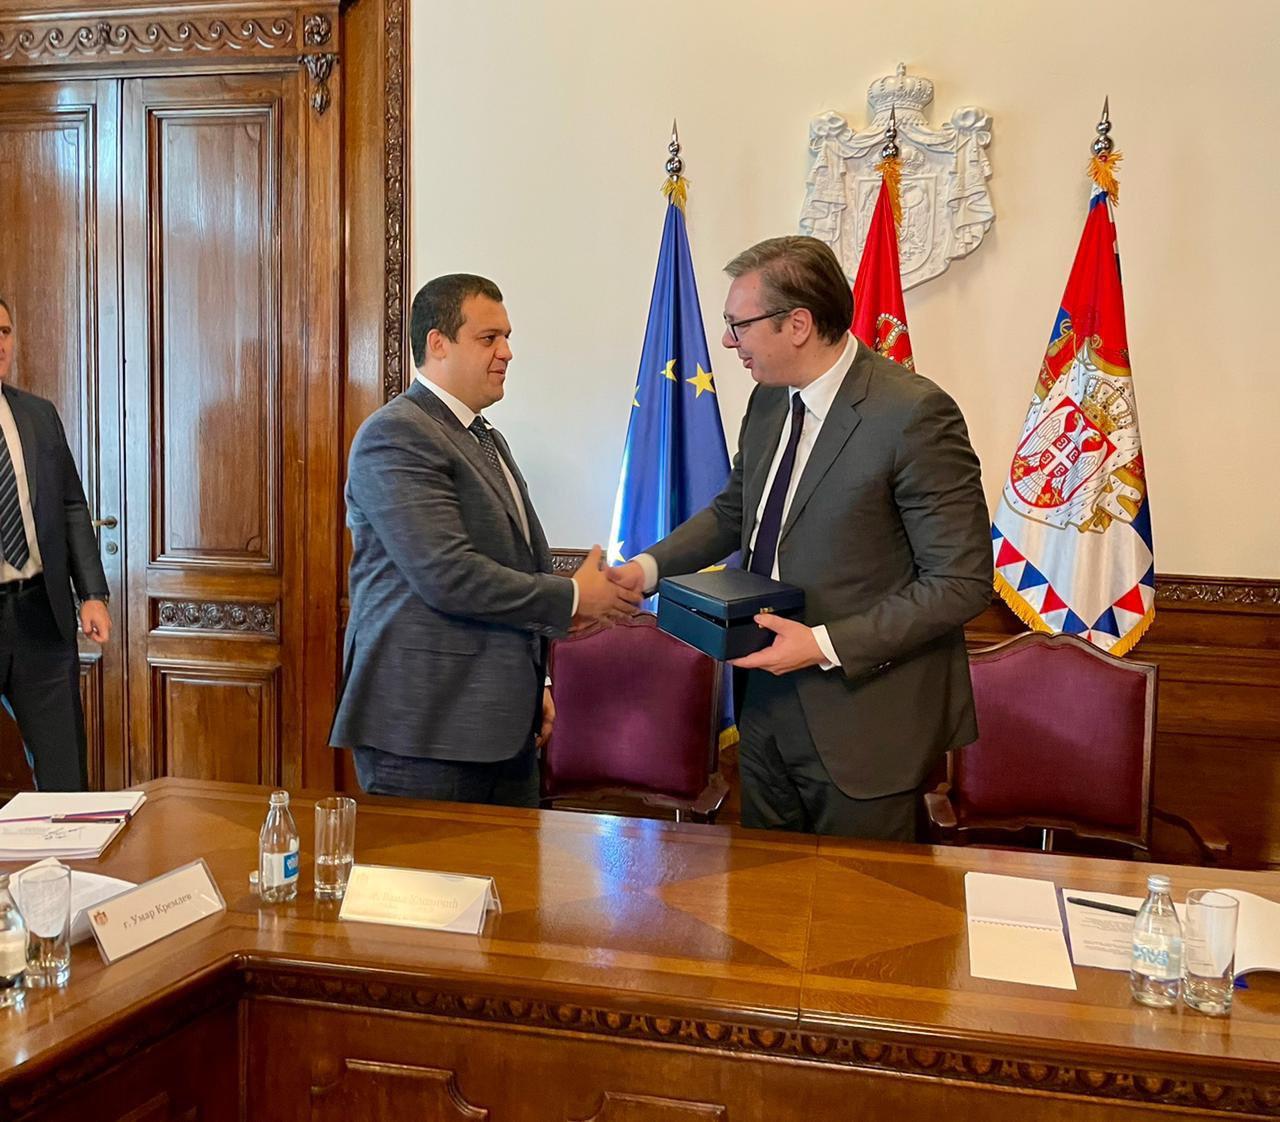 Kremlev meets Serbian President Vučić to discuss AIBA World Boxing Championships